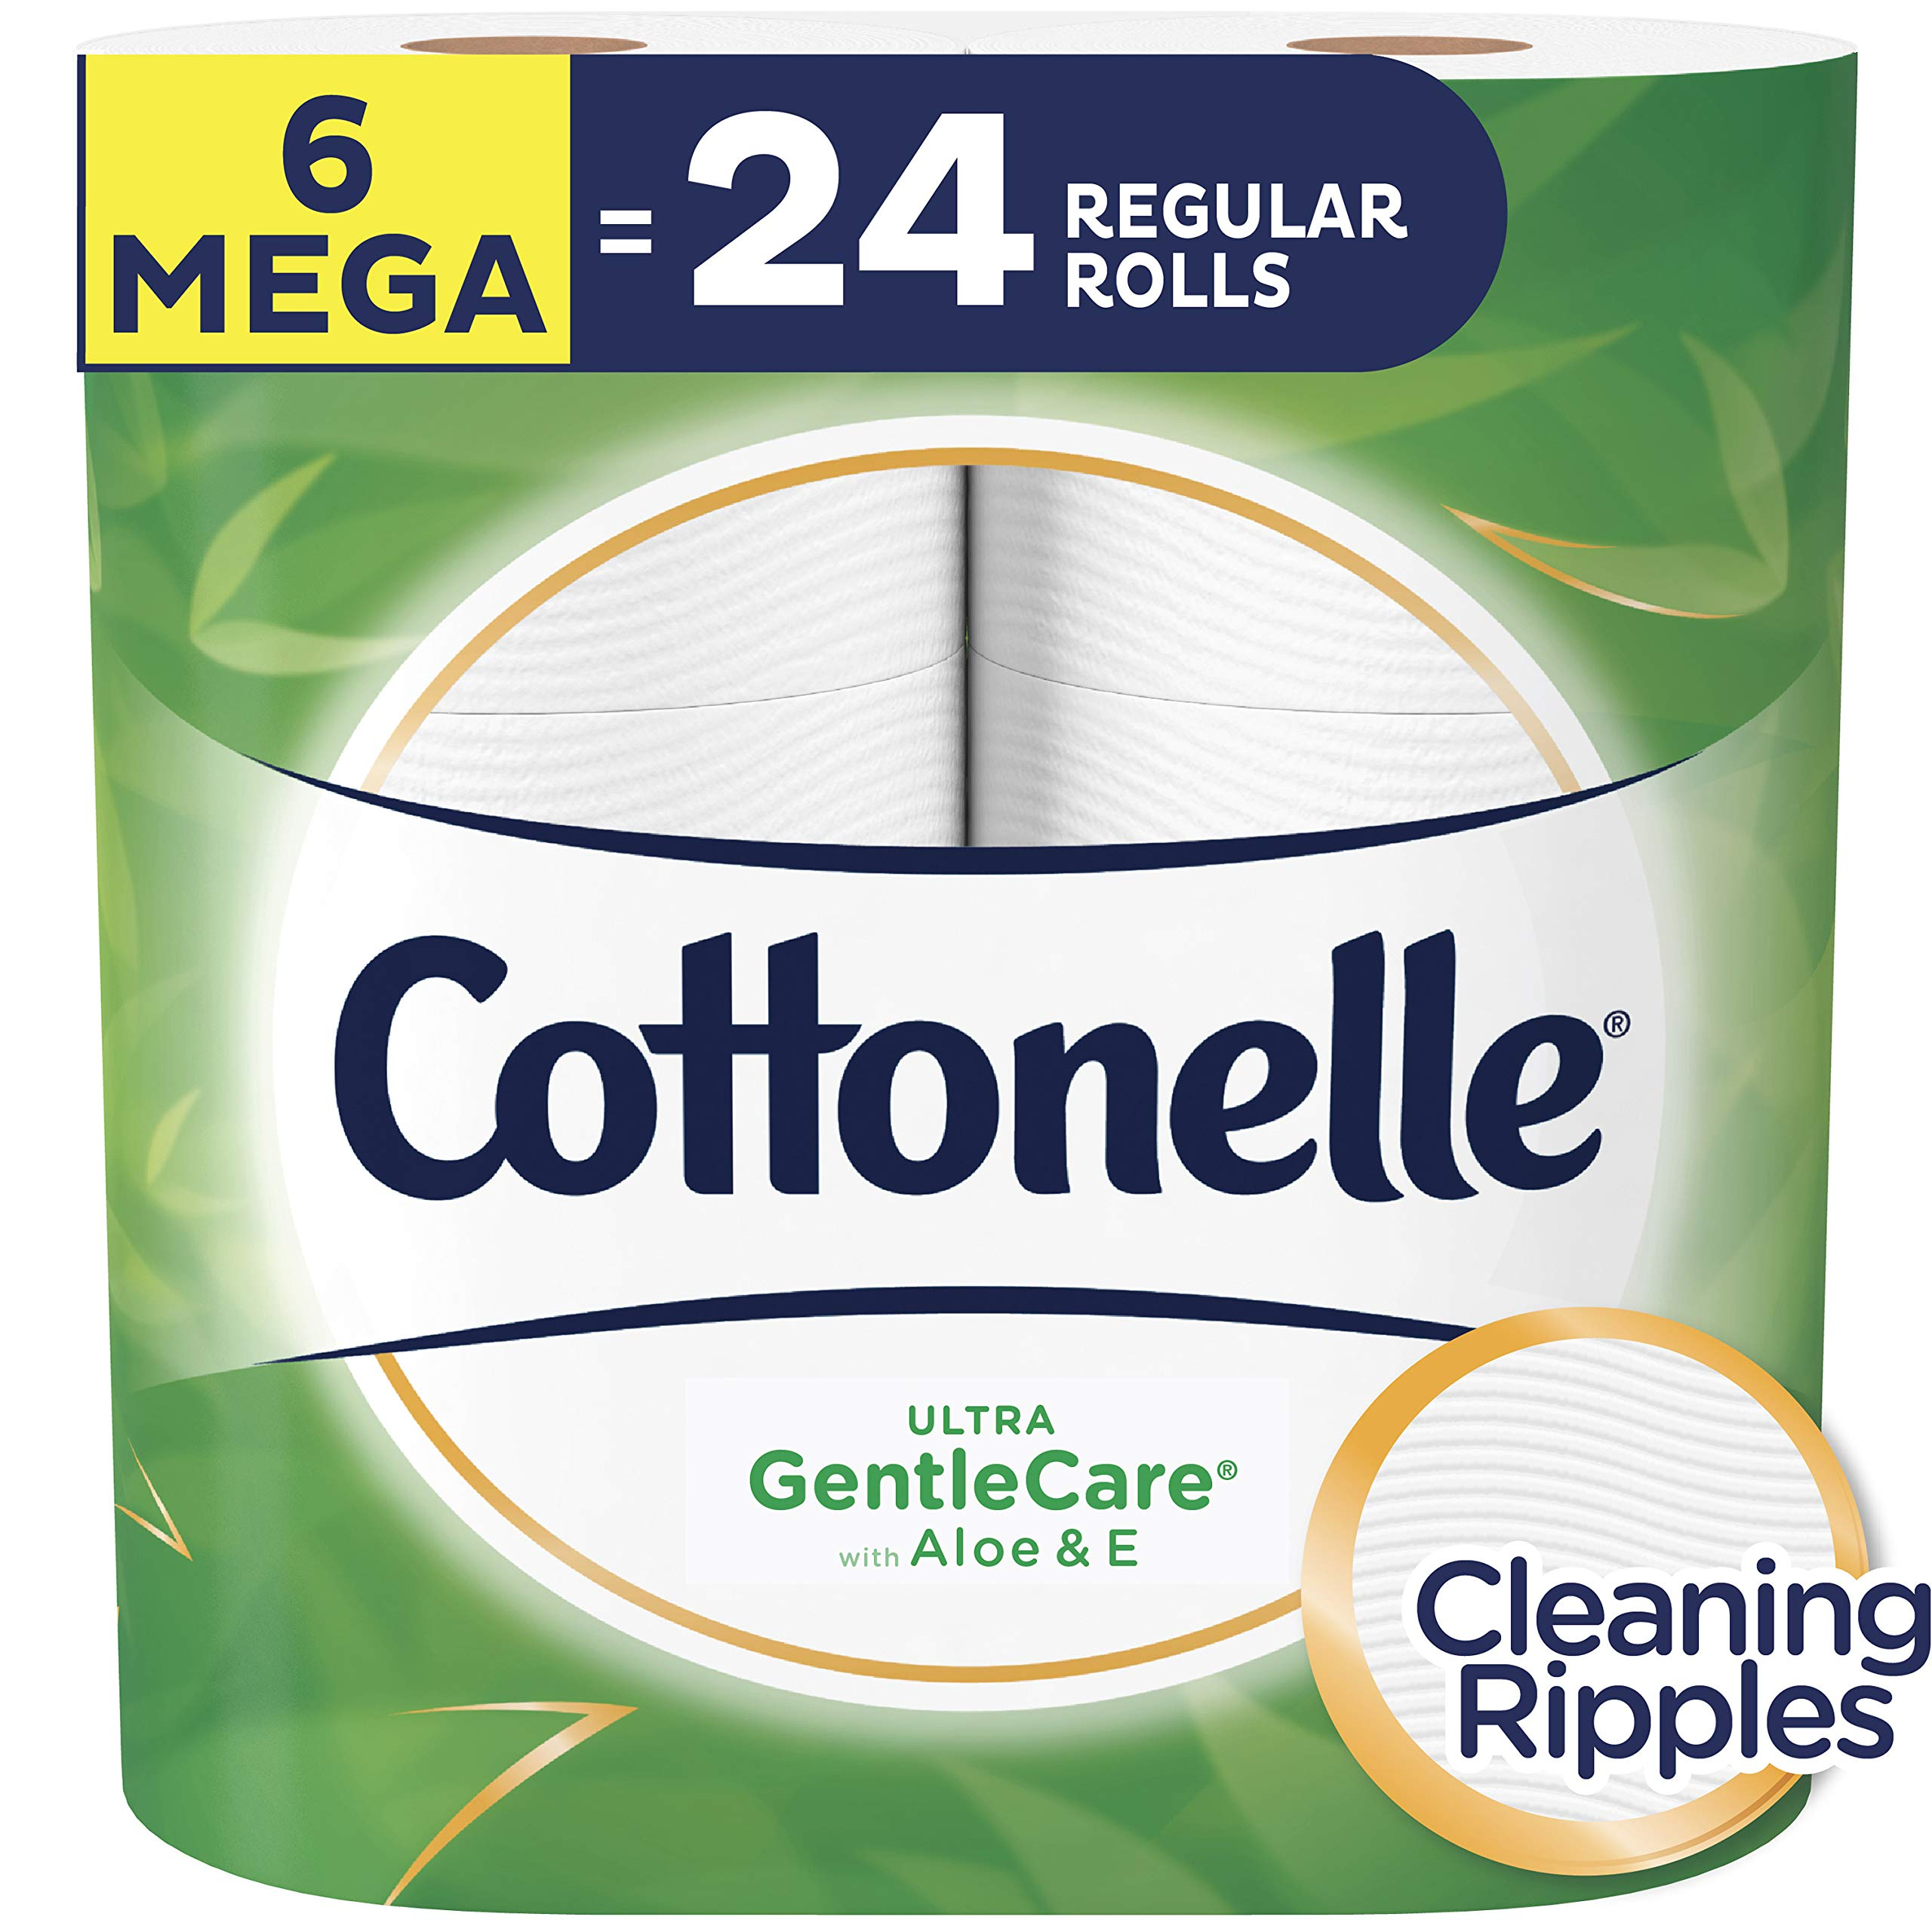 Cottonelle Ultra GentleCare Toilet Paper, Aloe & Vitamin E, 6 Mega Rolls by Cottonelle